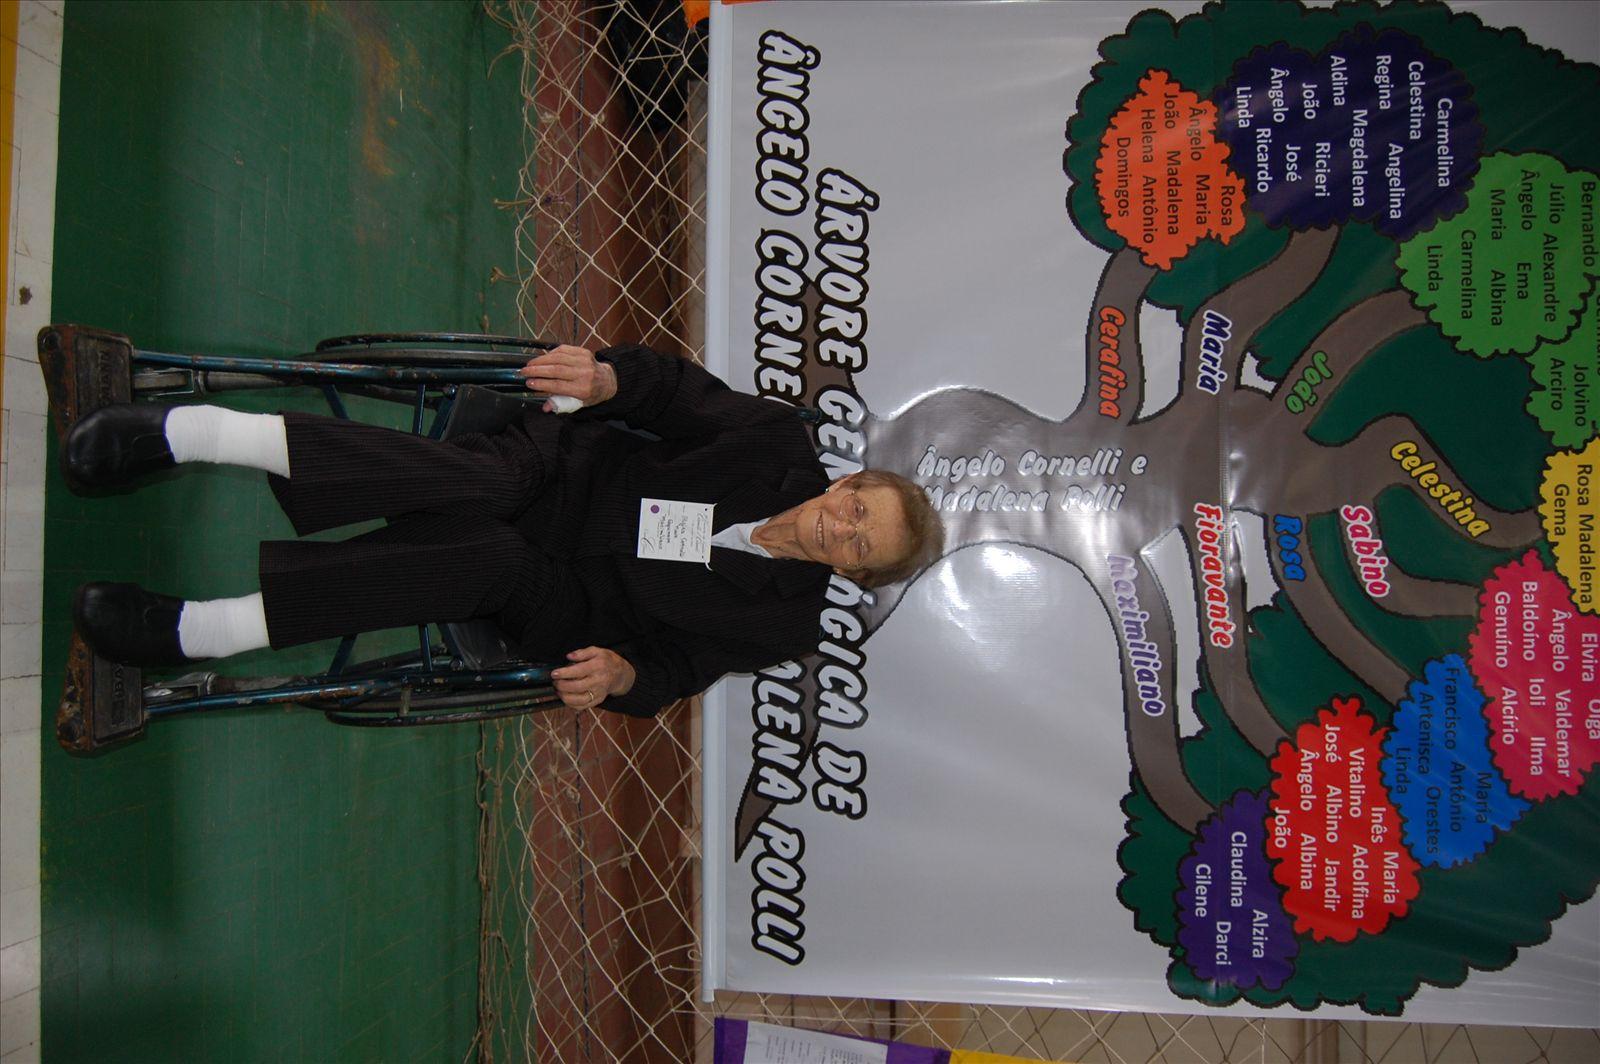 2º Encontro Família Cornelli - 11.10.2009 (208)_0